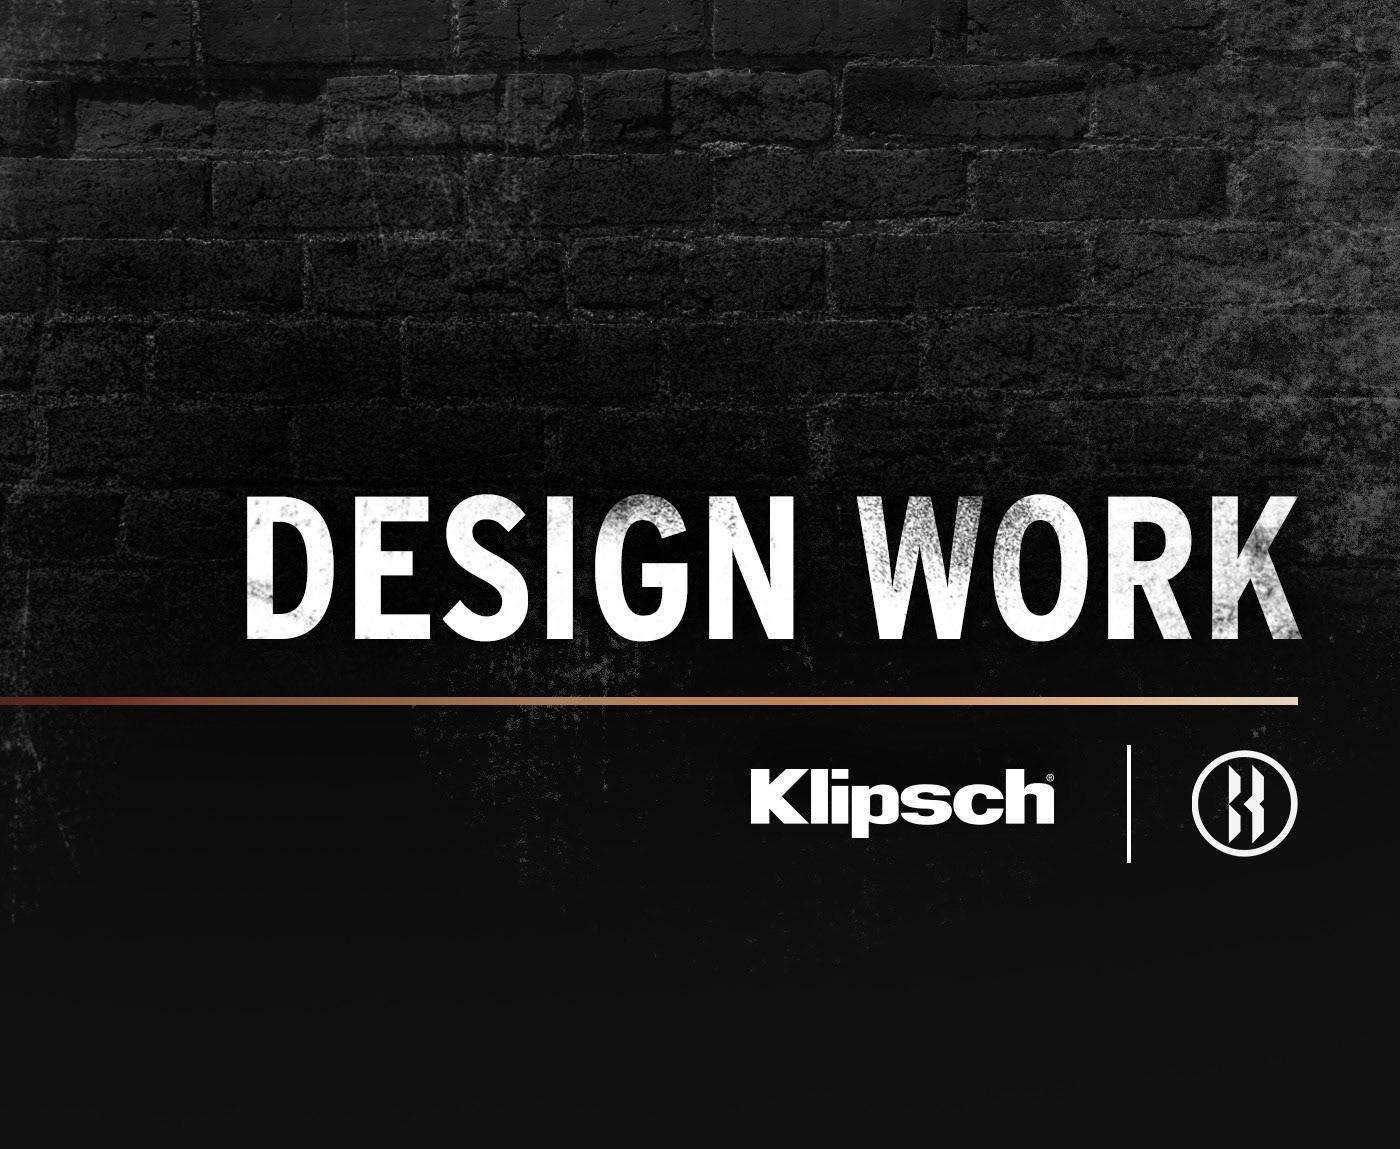 Klipsch speakers Audio advertisements Photography  graphic design  Photo Manipulation  photo compositing headphones grunge